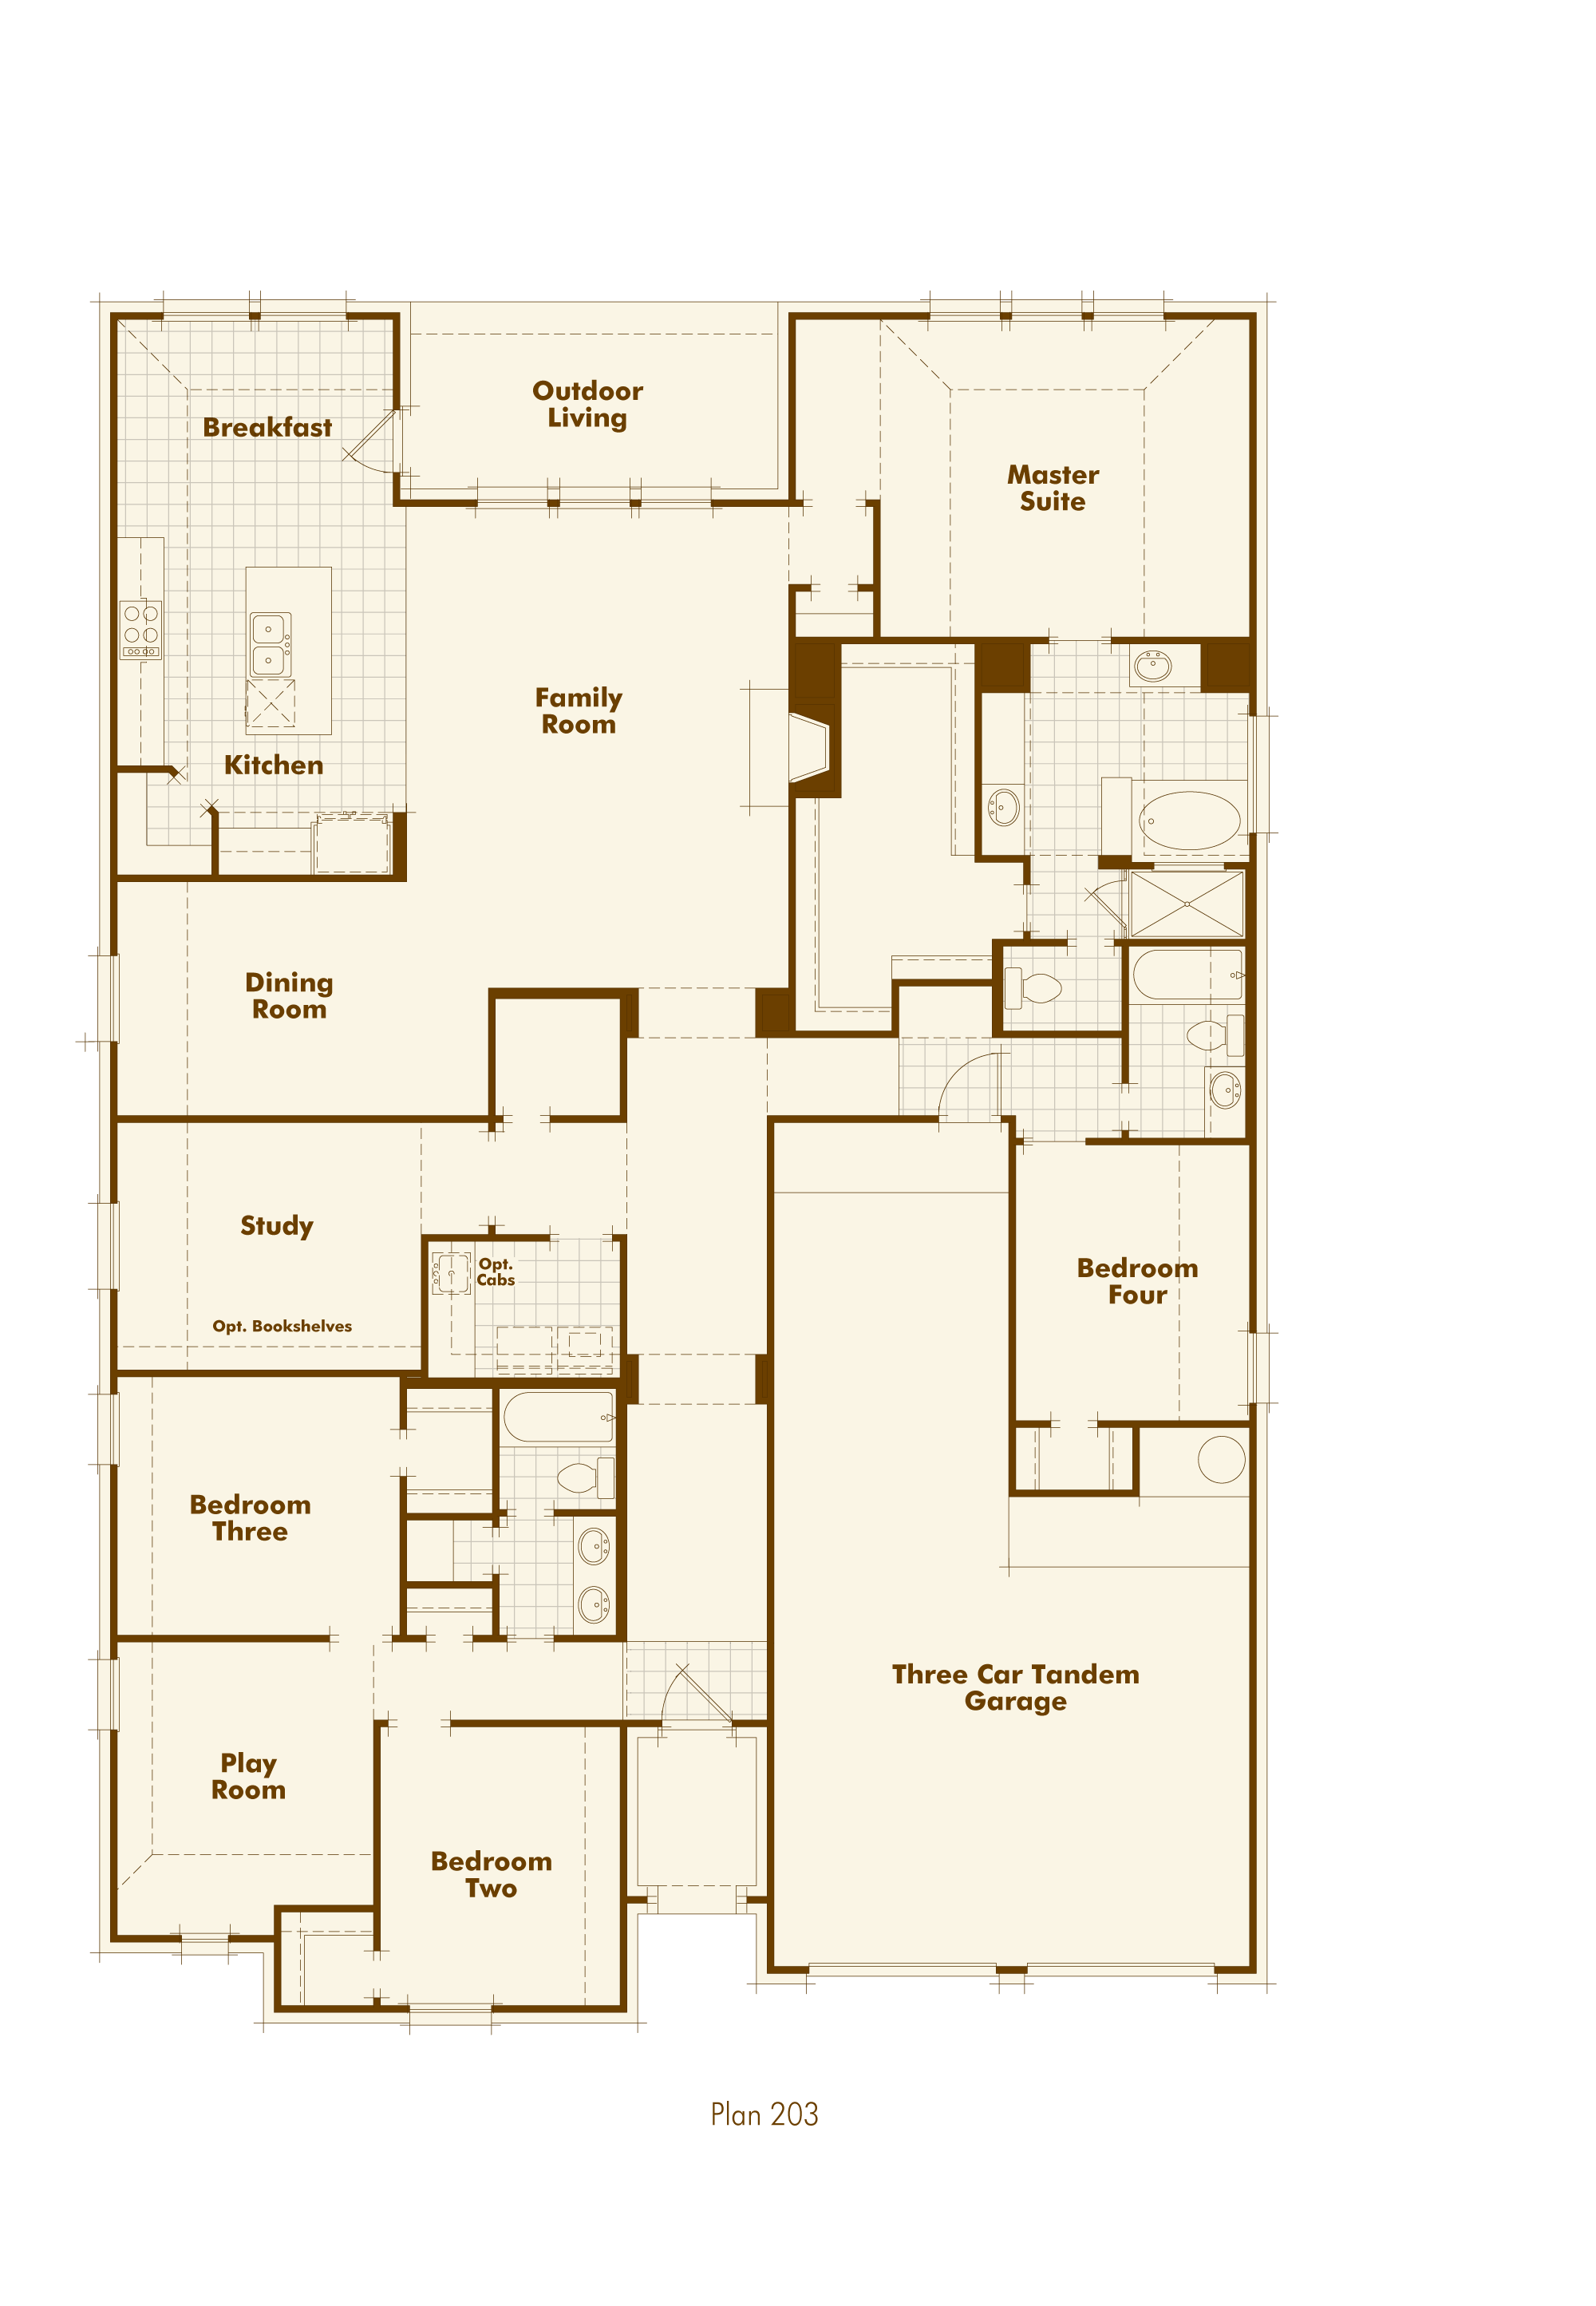 New Home Plan In Richmond Tx - highland homes floor plans houston ...